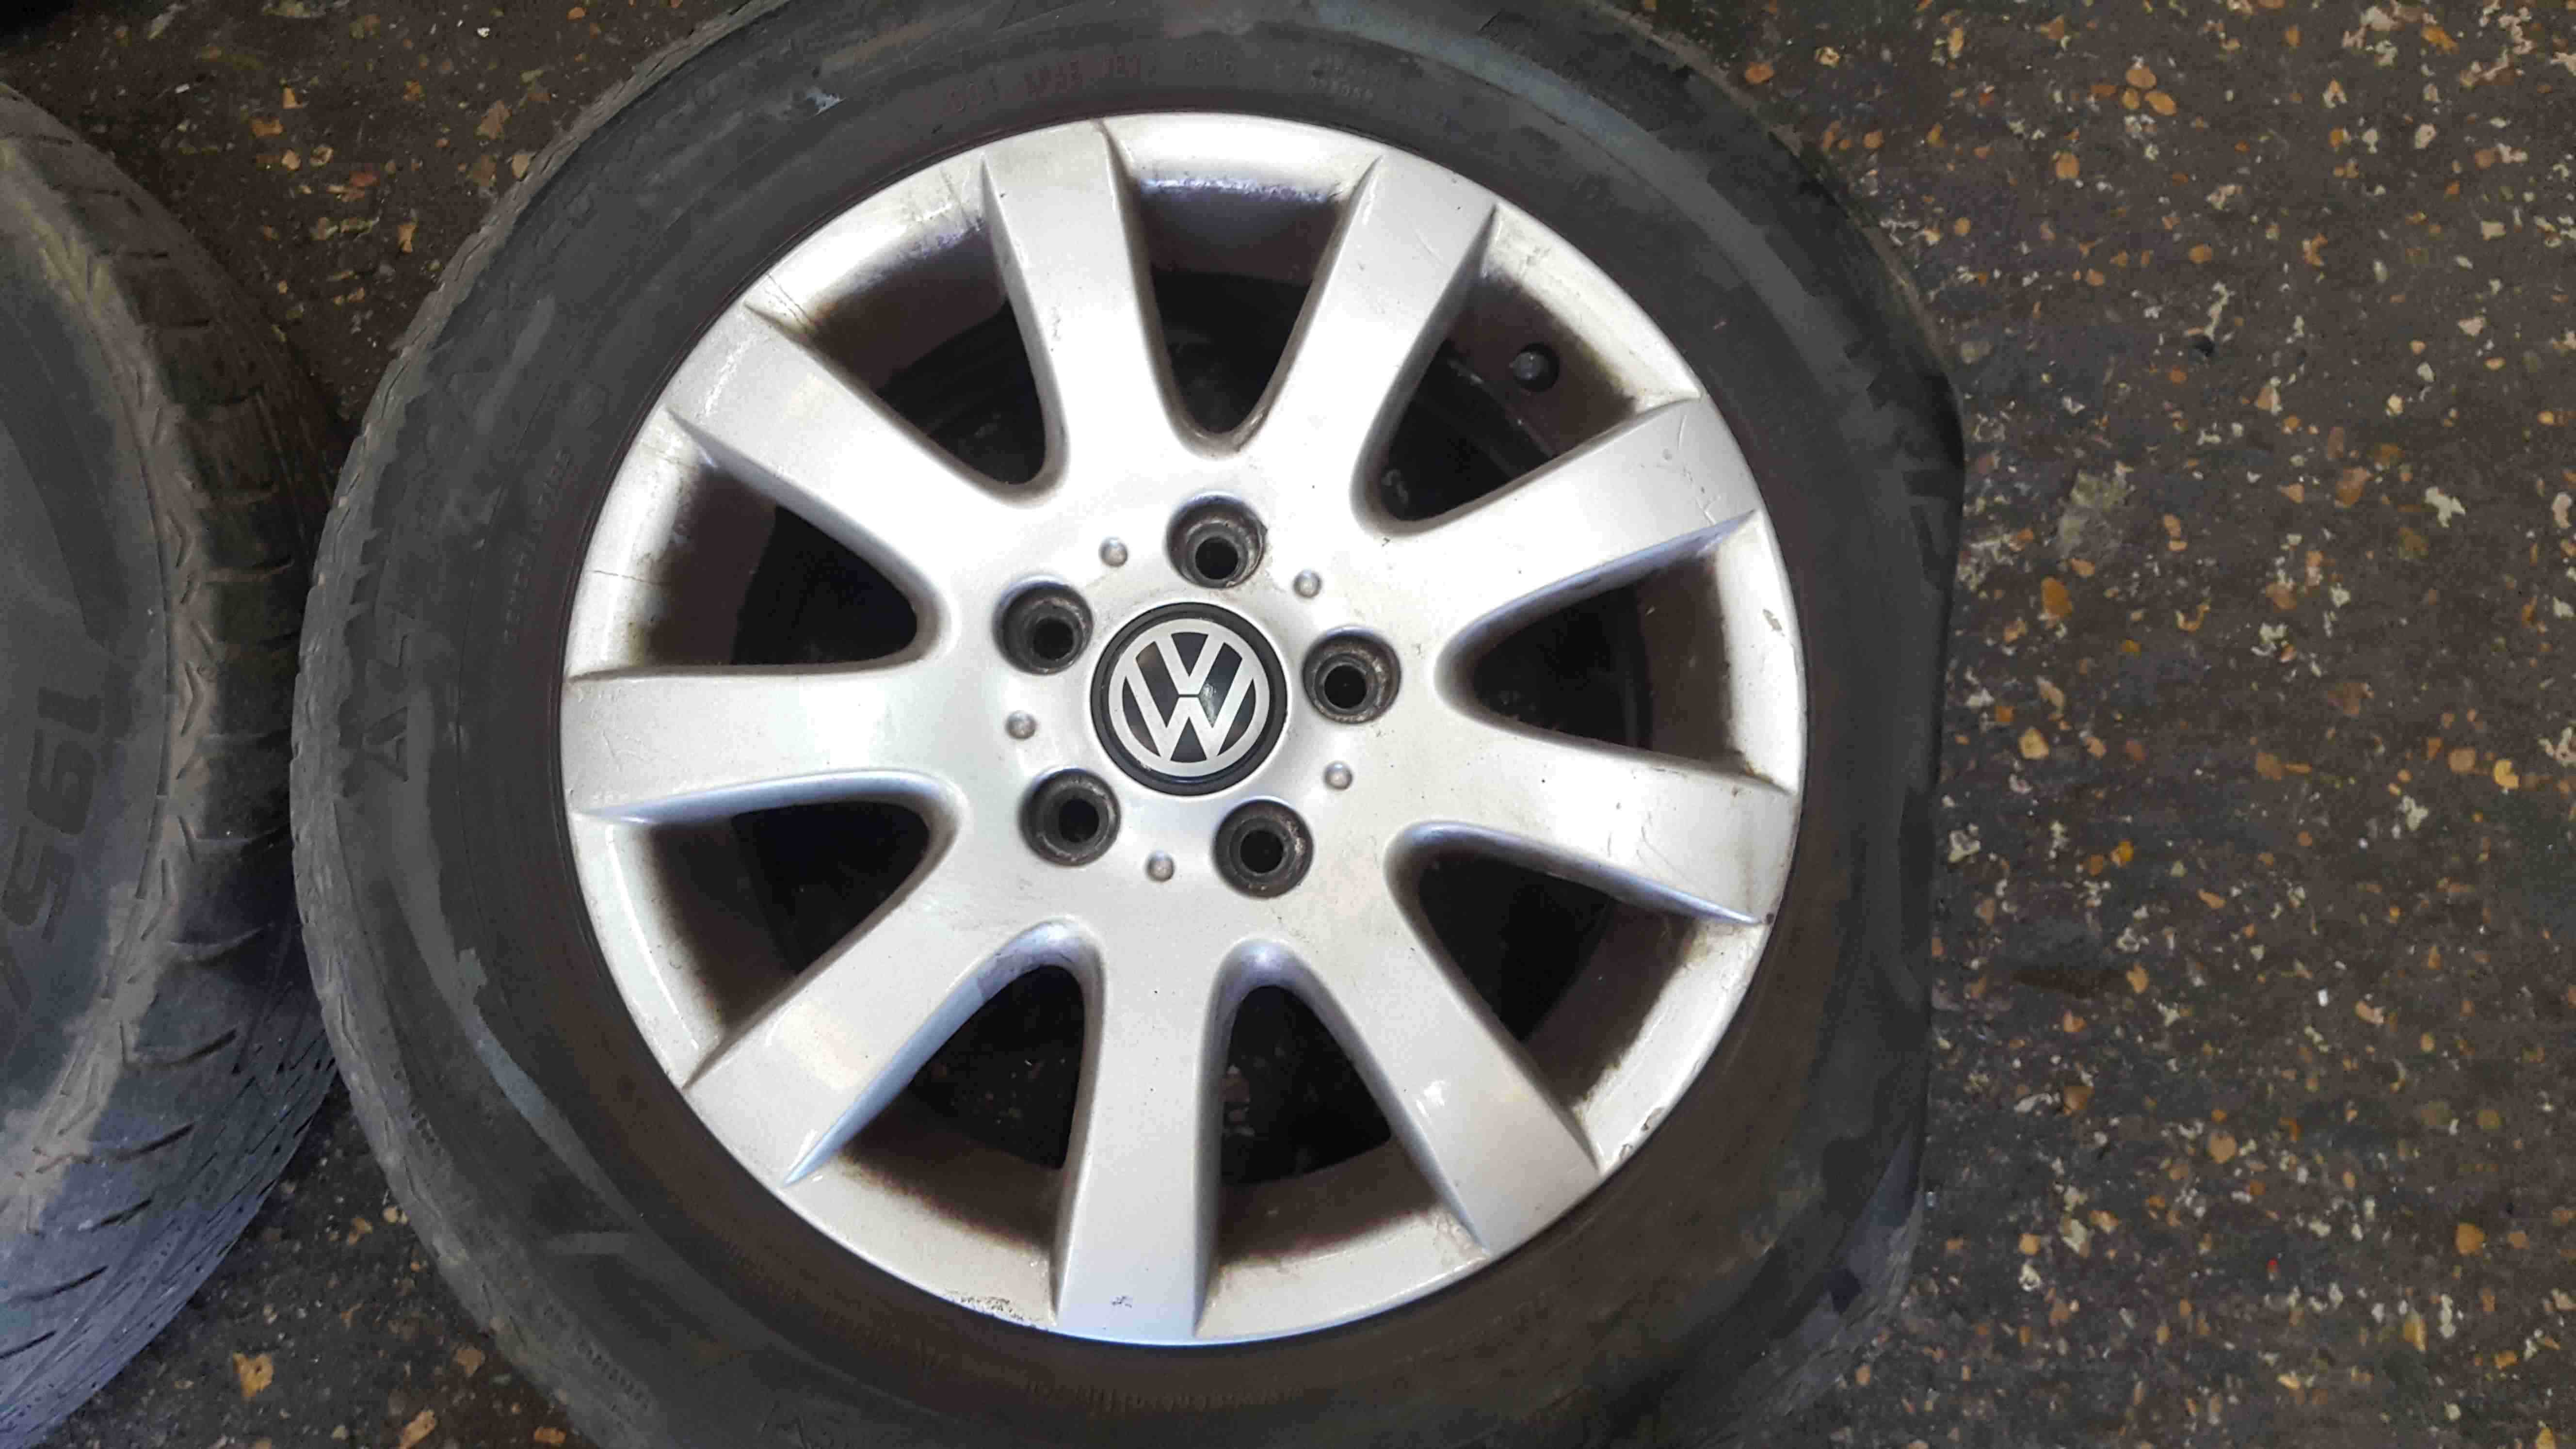 Volkswagen Golf MK5 2003-2009 Alloy Wheels Set X4 15inch 1K0601025A